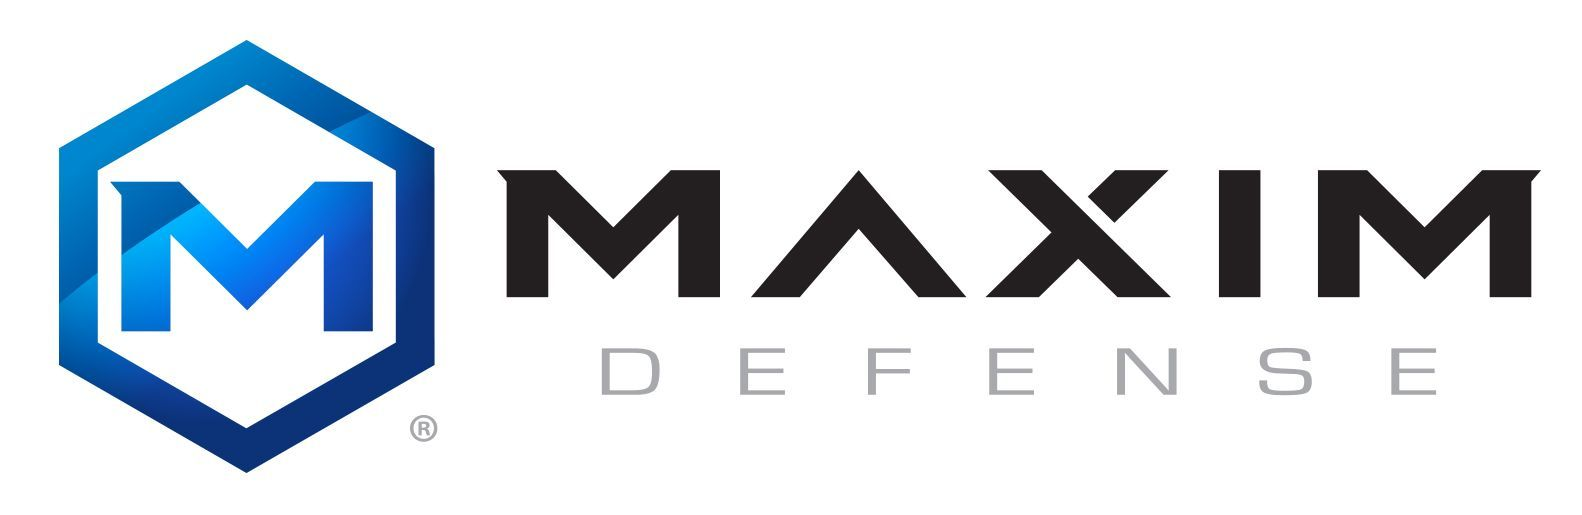 Maxim Defence